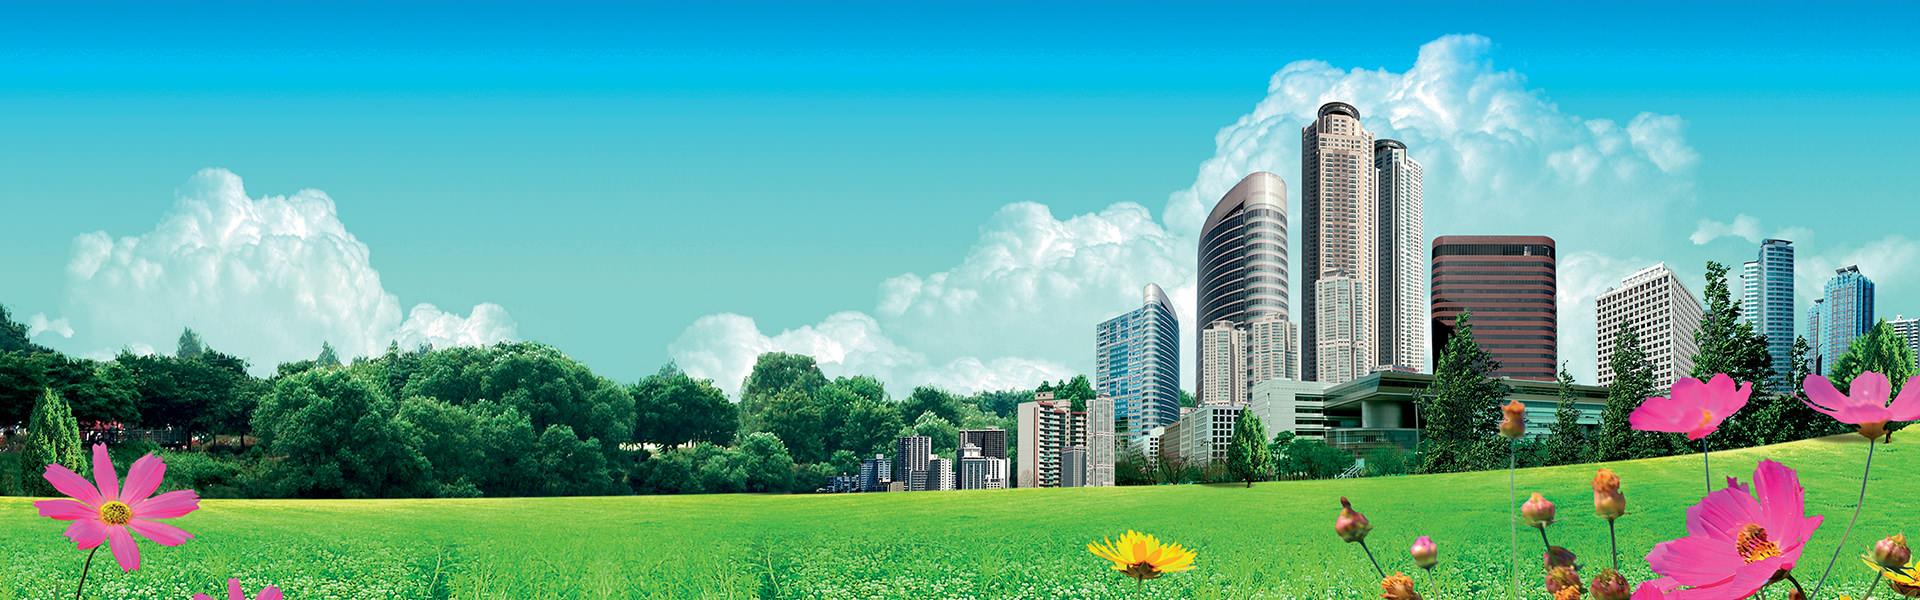 Stea Servizi Tecnologici Energetici ed ambientali